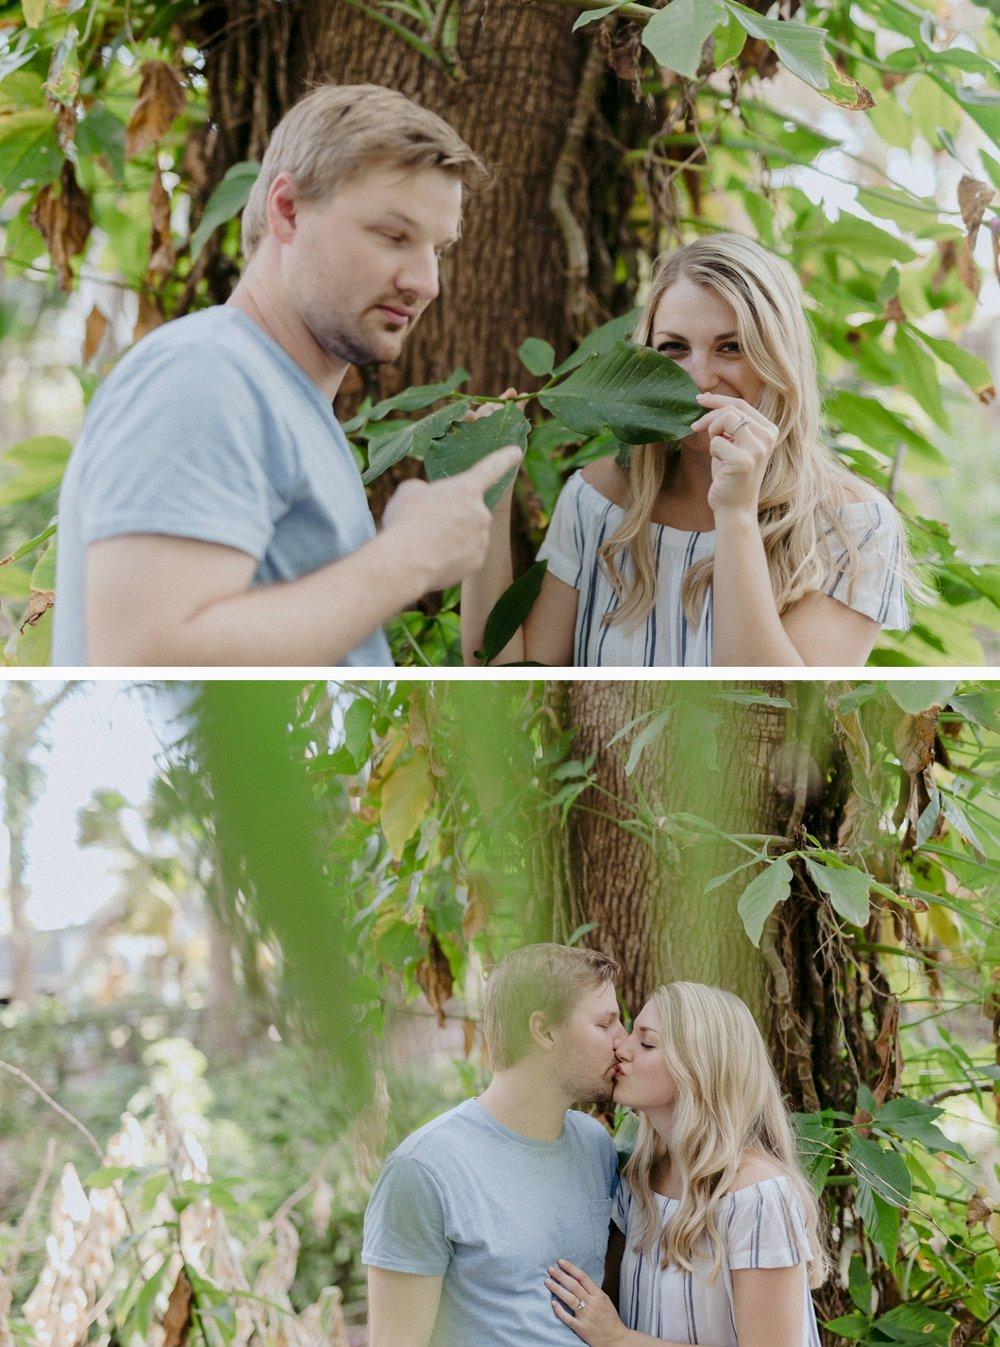 Kylie-And-Jack-Mead-Botanical-Garden-Engagement_0024.jpg